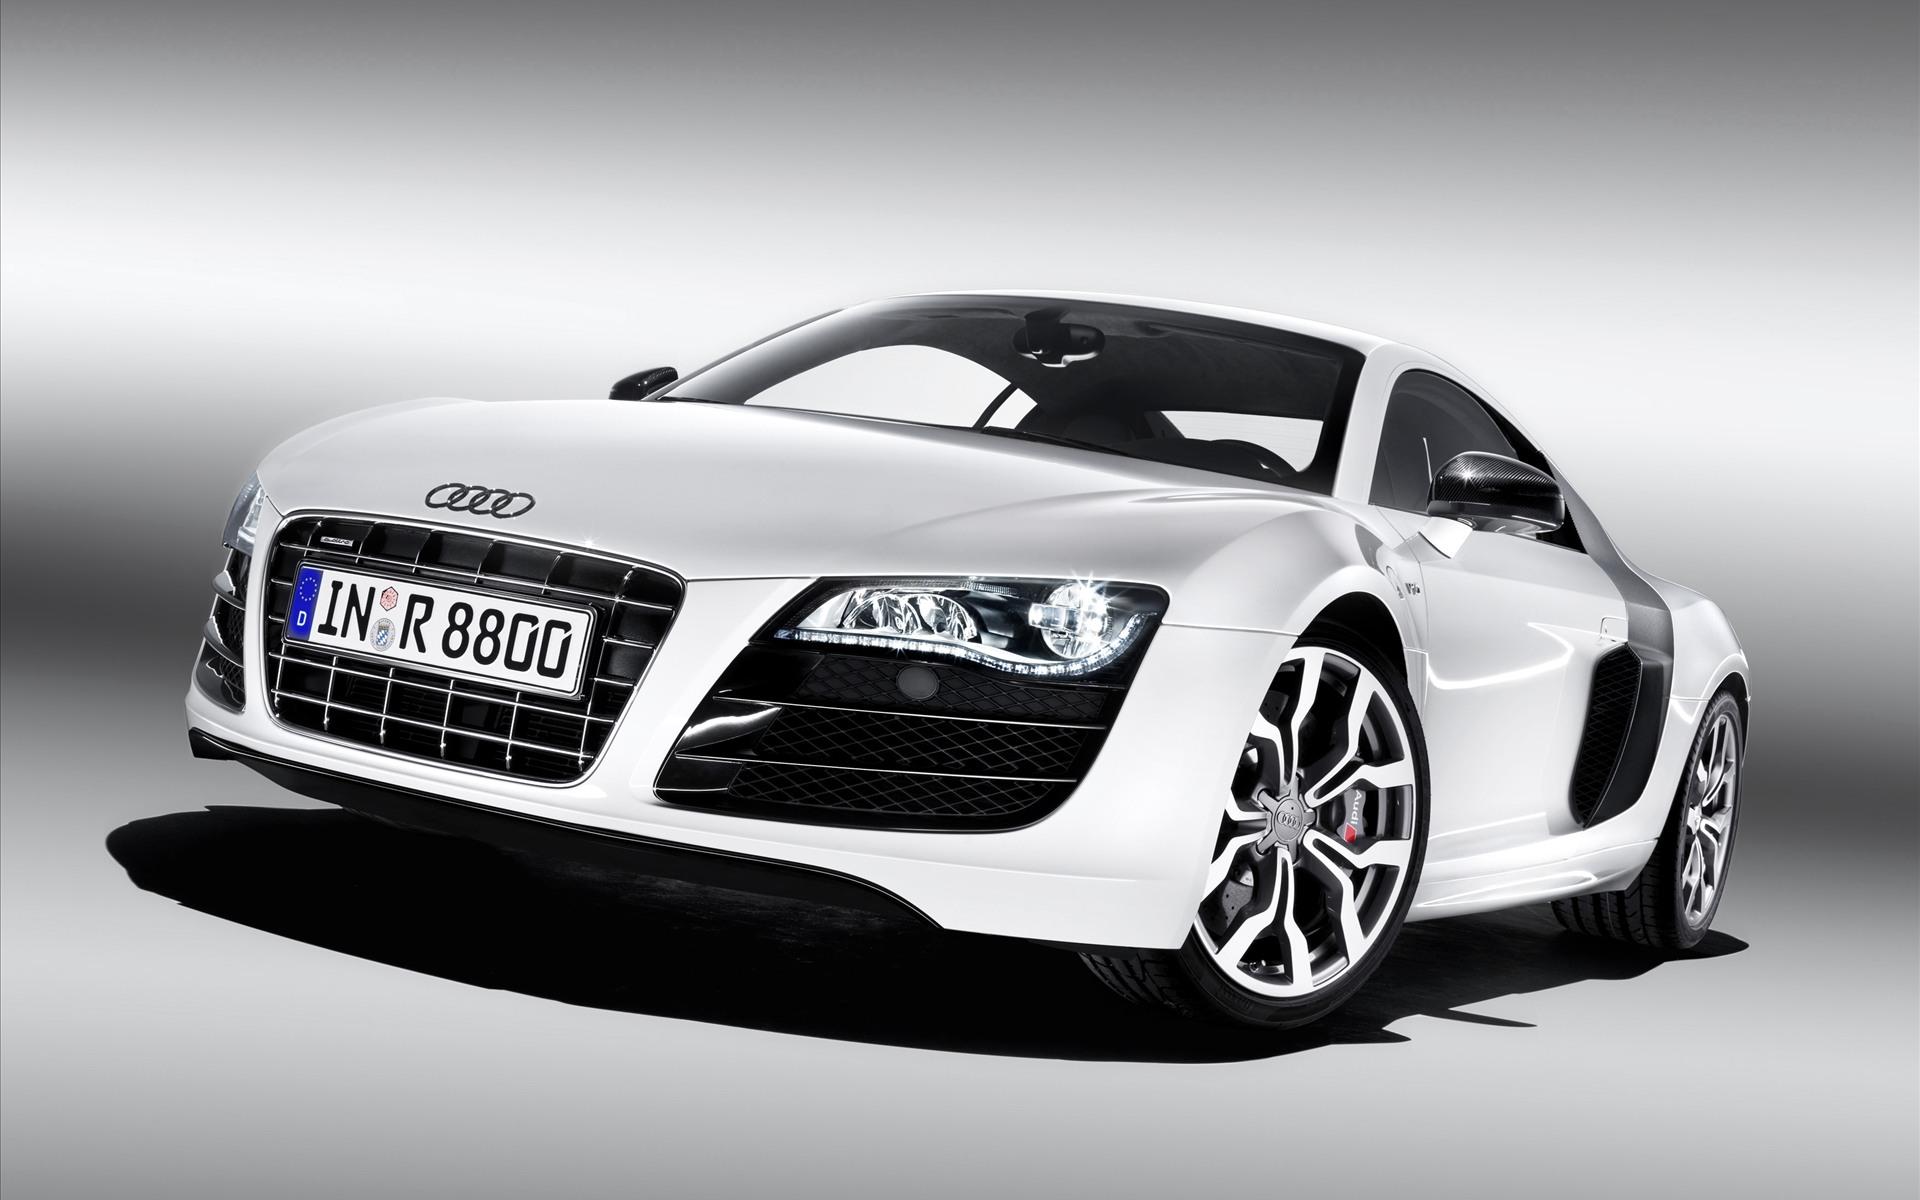 Audi-luxury-car-wallpaper-wpc5802354